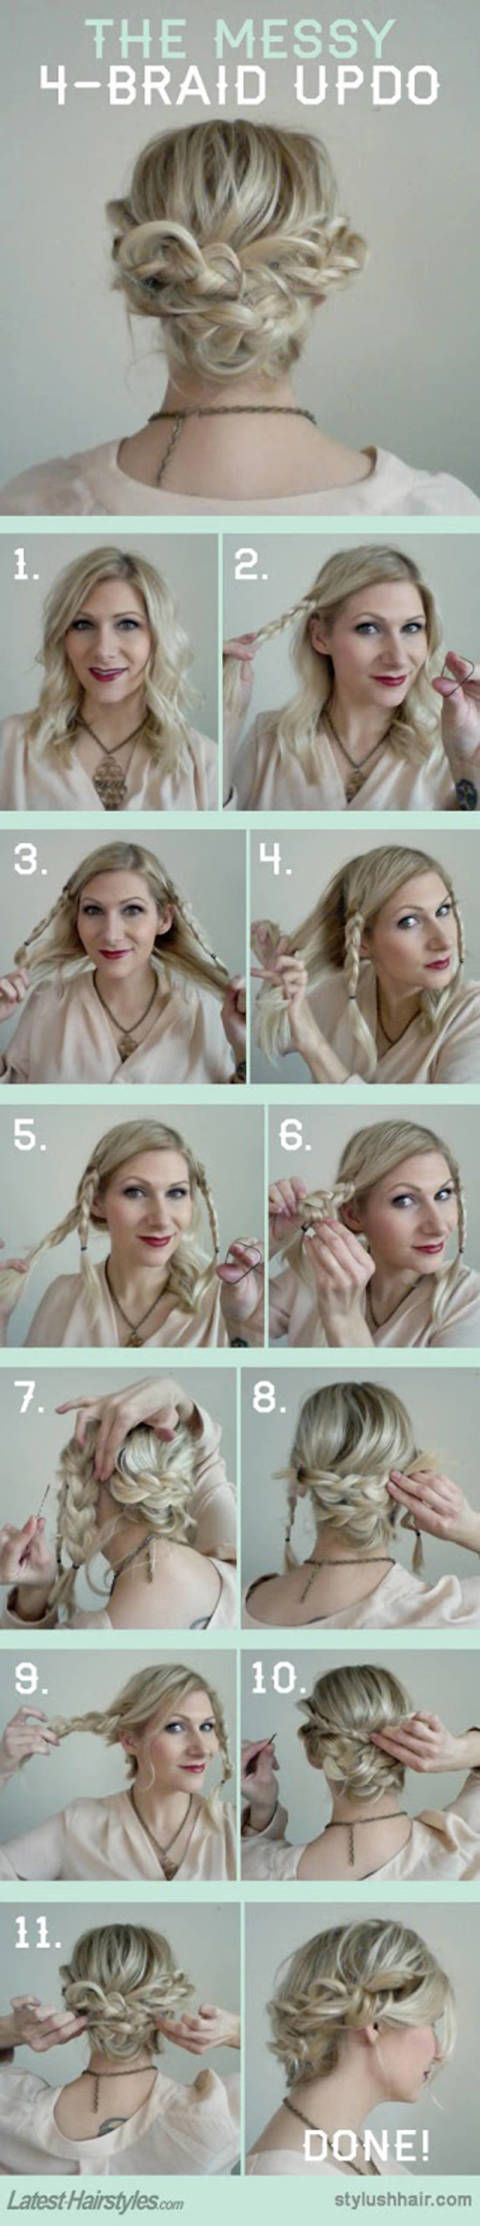 best kristin hair images on pinterest cute hairstyles hair